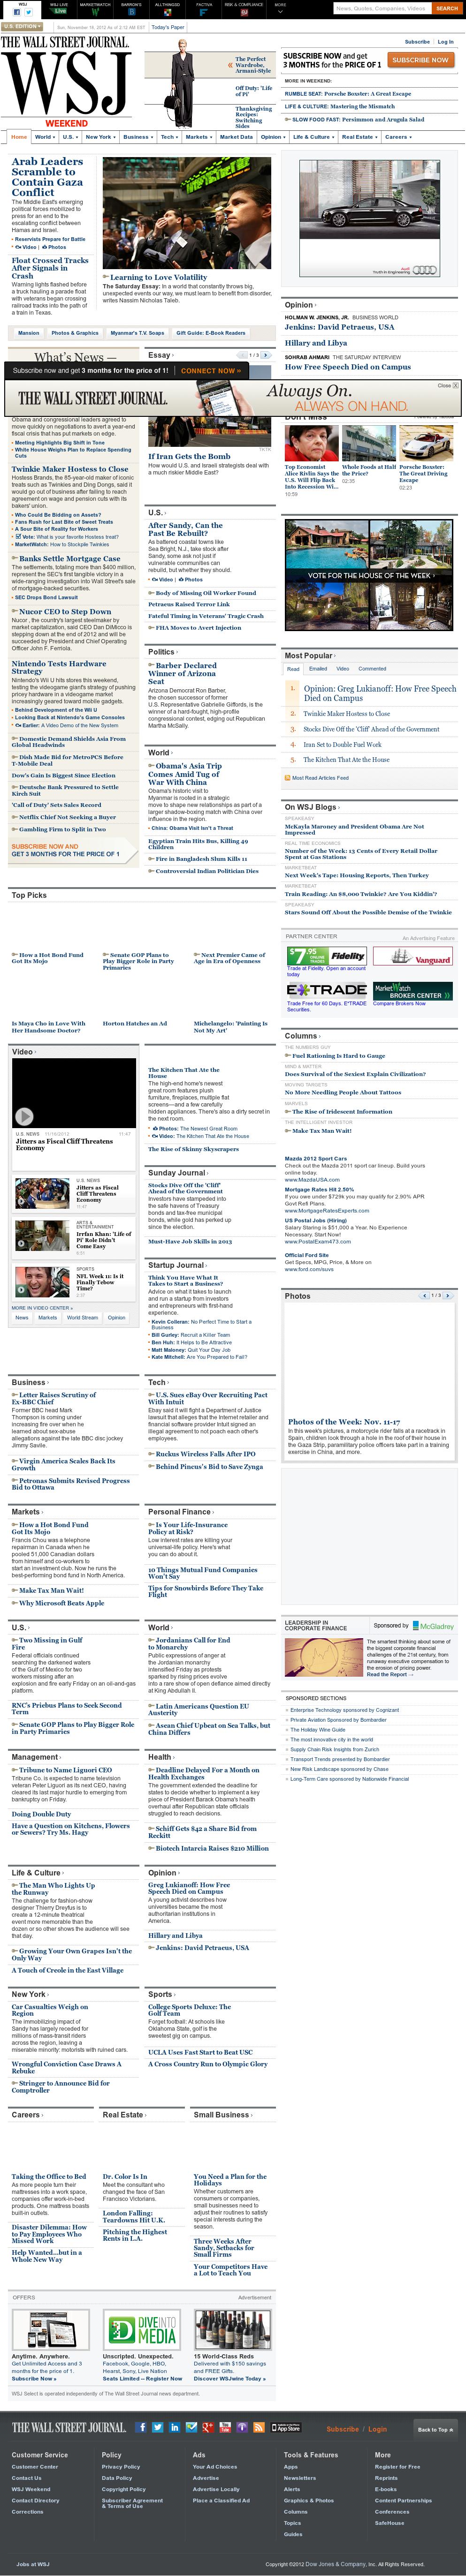 The Wall Street Journal at Sunday Nov. 18, 2012, 12:31 p.m. UTC